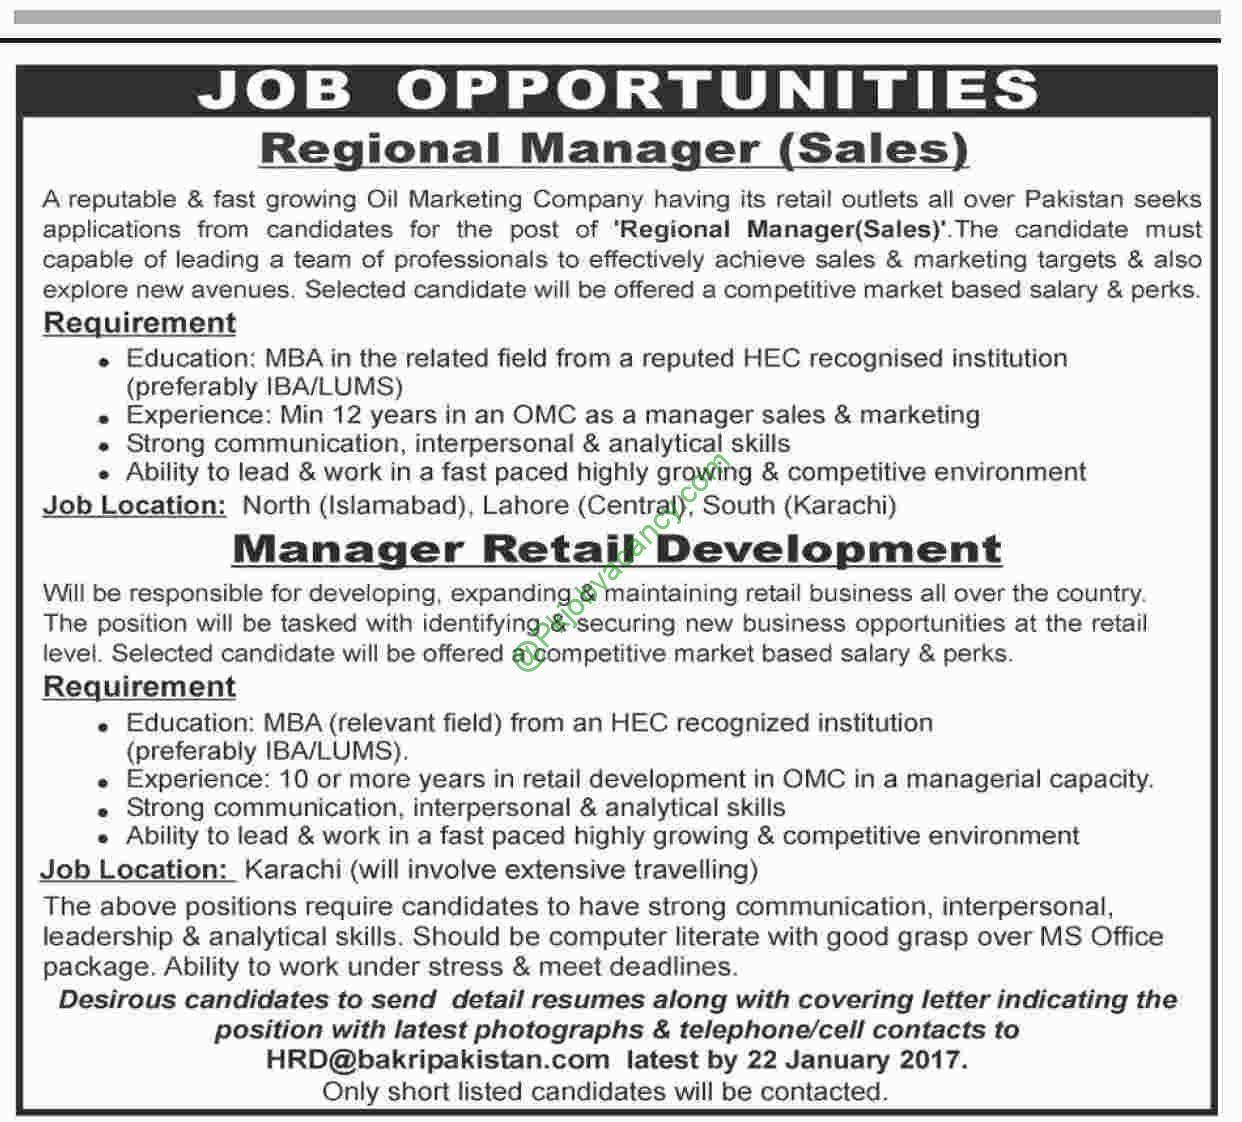 Oil Marketing Company BAKRI Jobs In Multiple Cities Apply Online